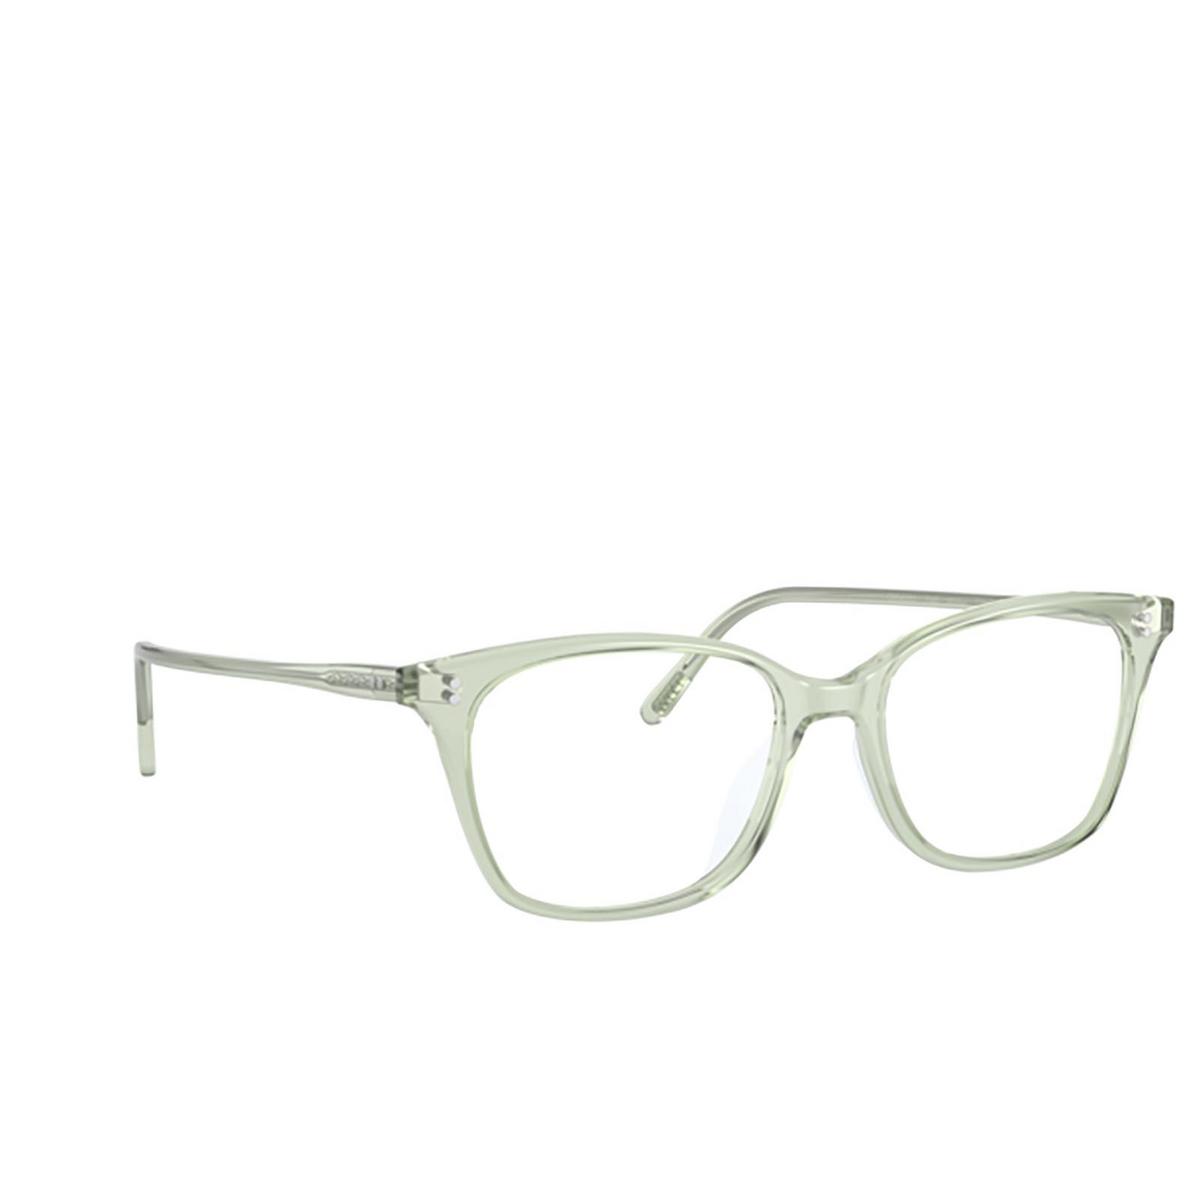 Oliver Peoples® Square Eyeglasses: Addilyn OV5438U color Washed Sage 1640 - three-quarters view.